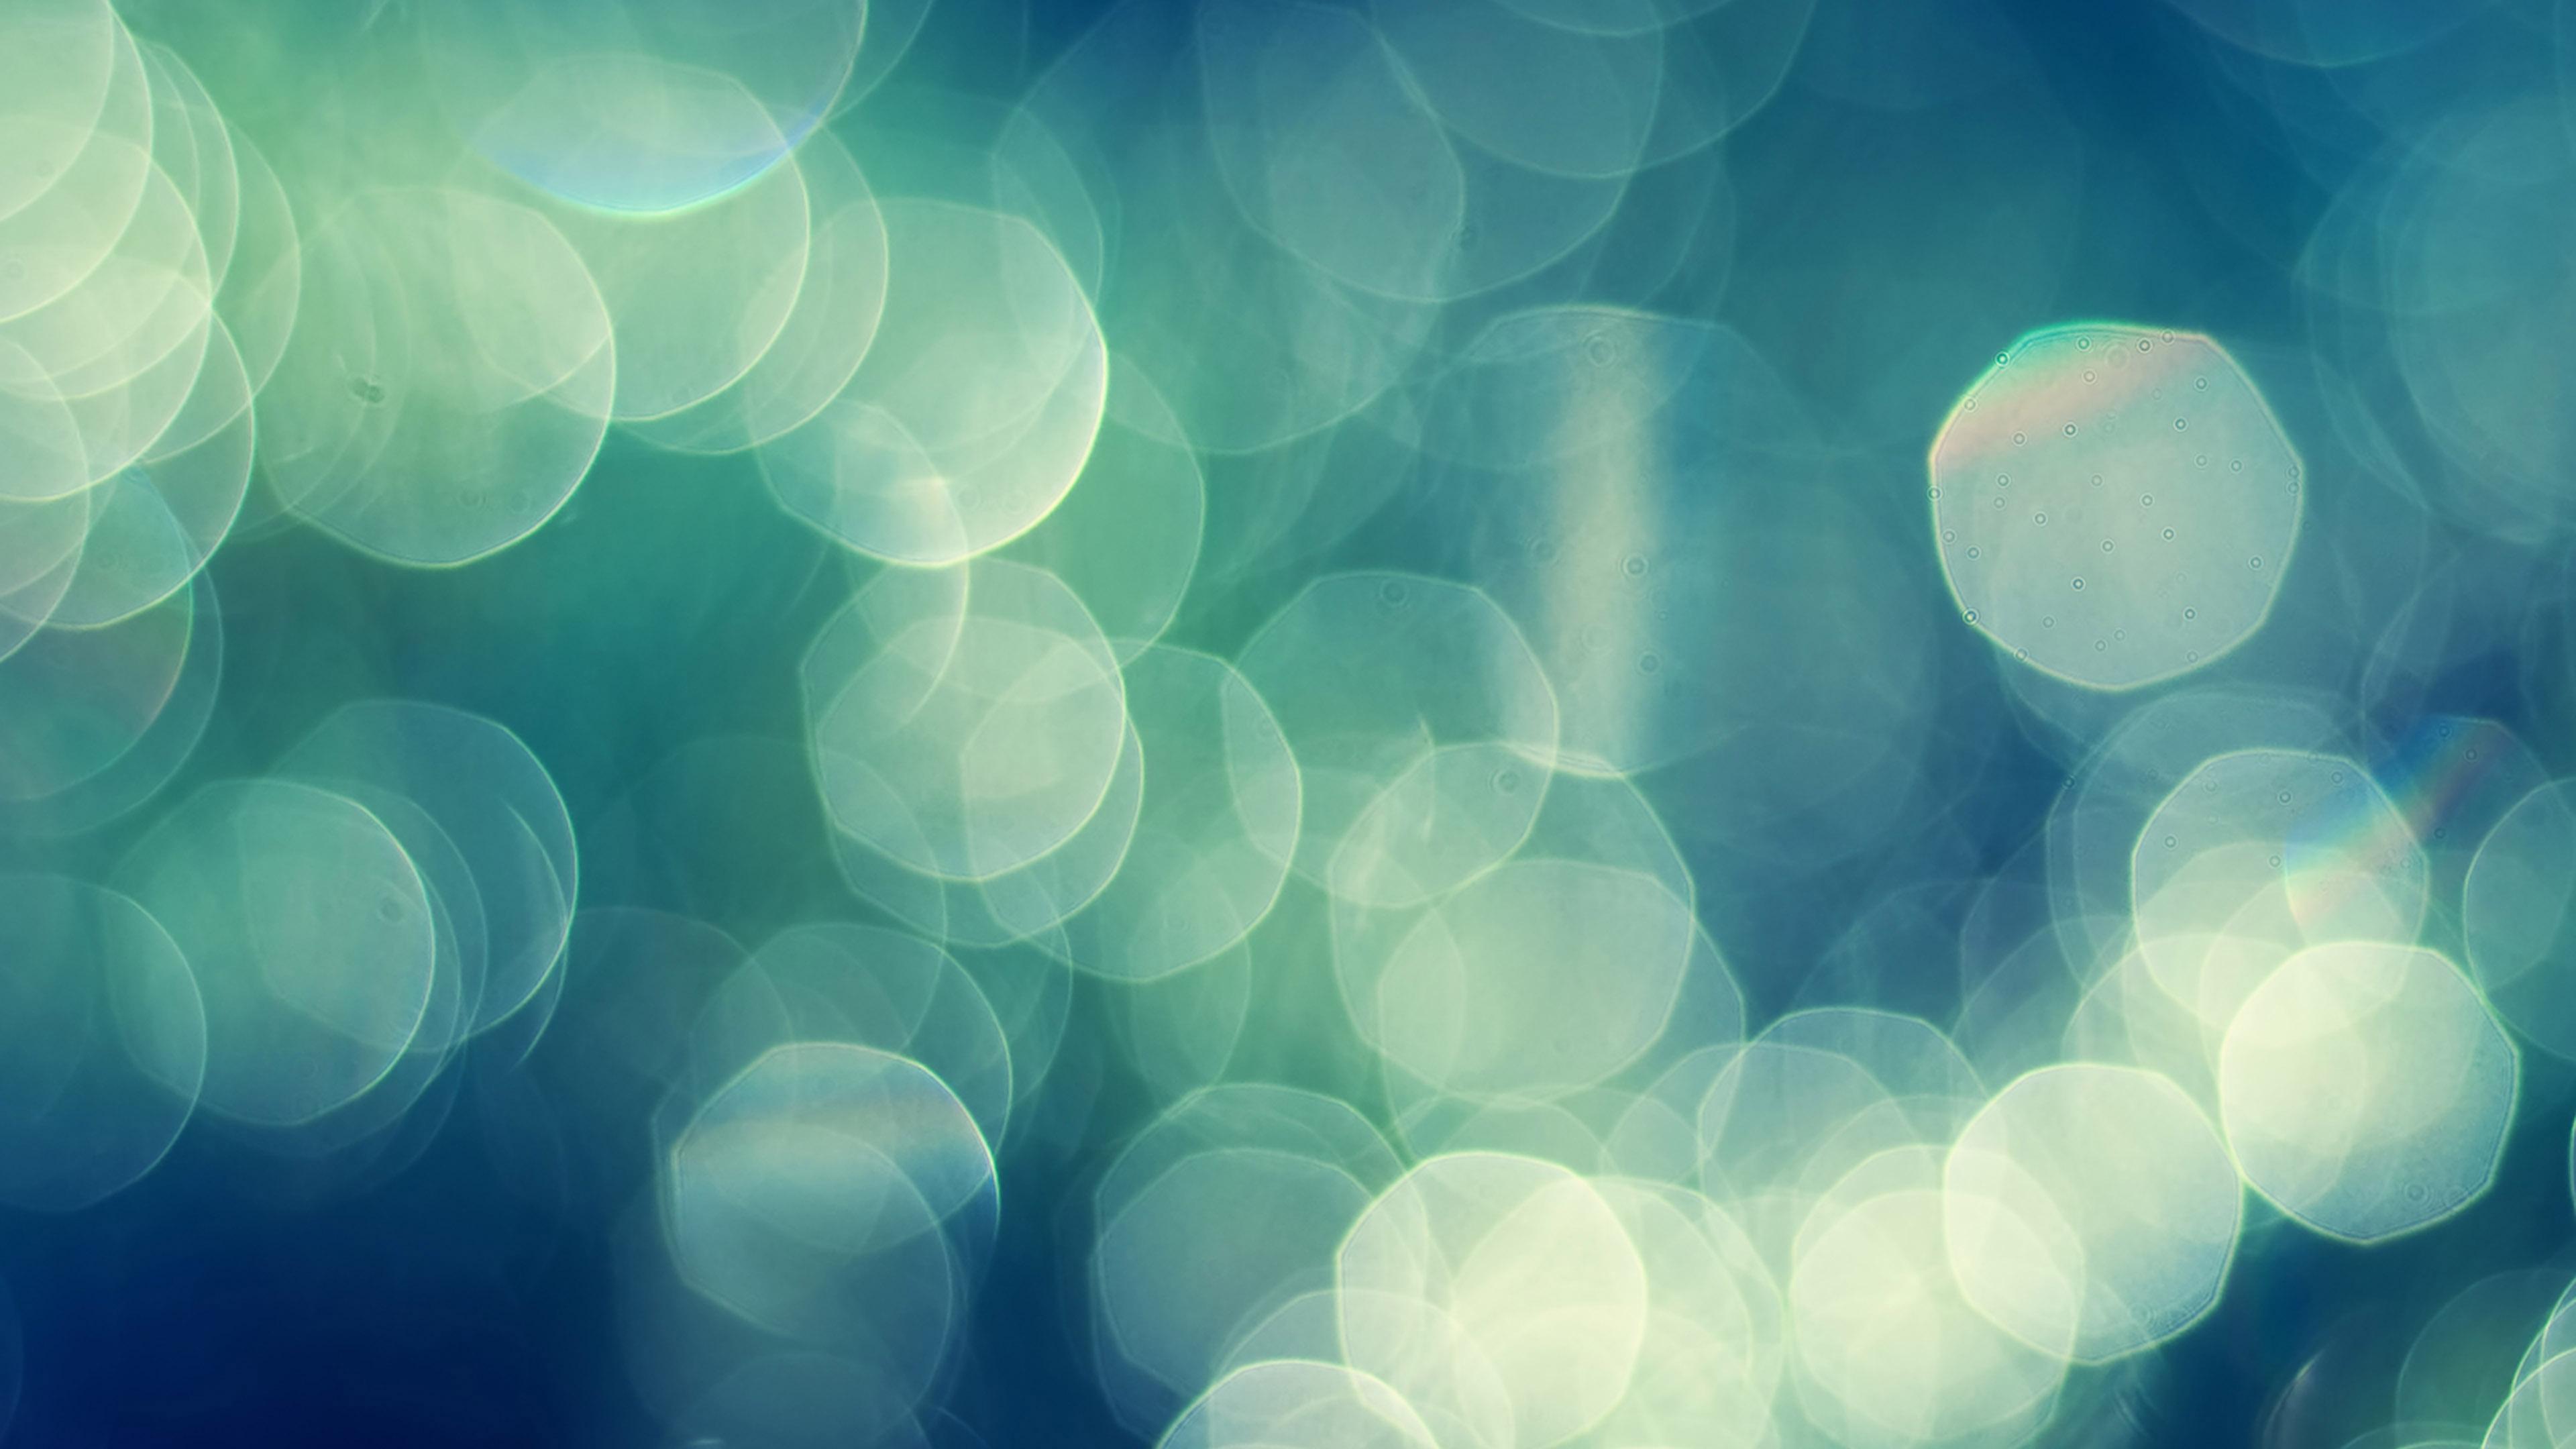 Romantic Ipad Wallpaper: Vc08-bokeh-nature-lights-blur